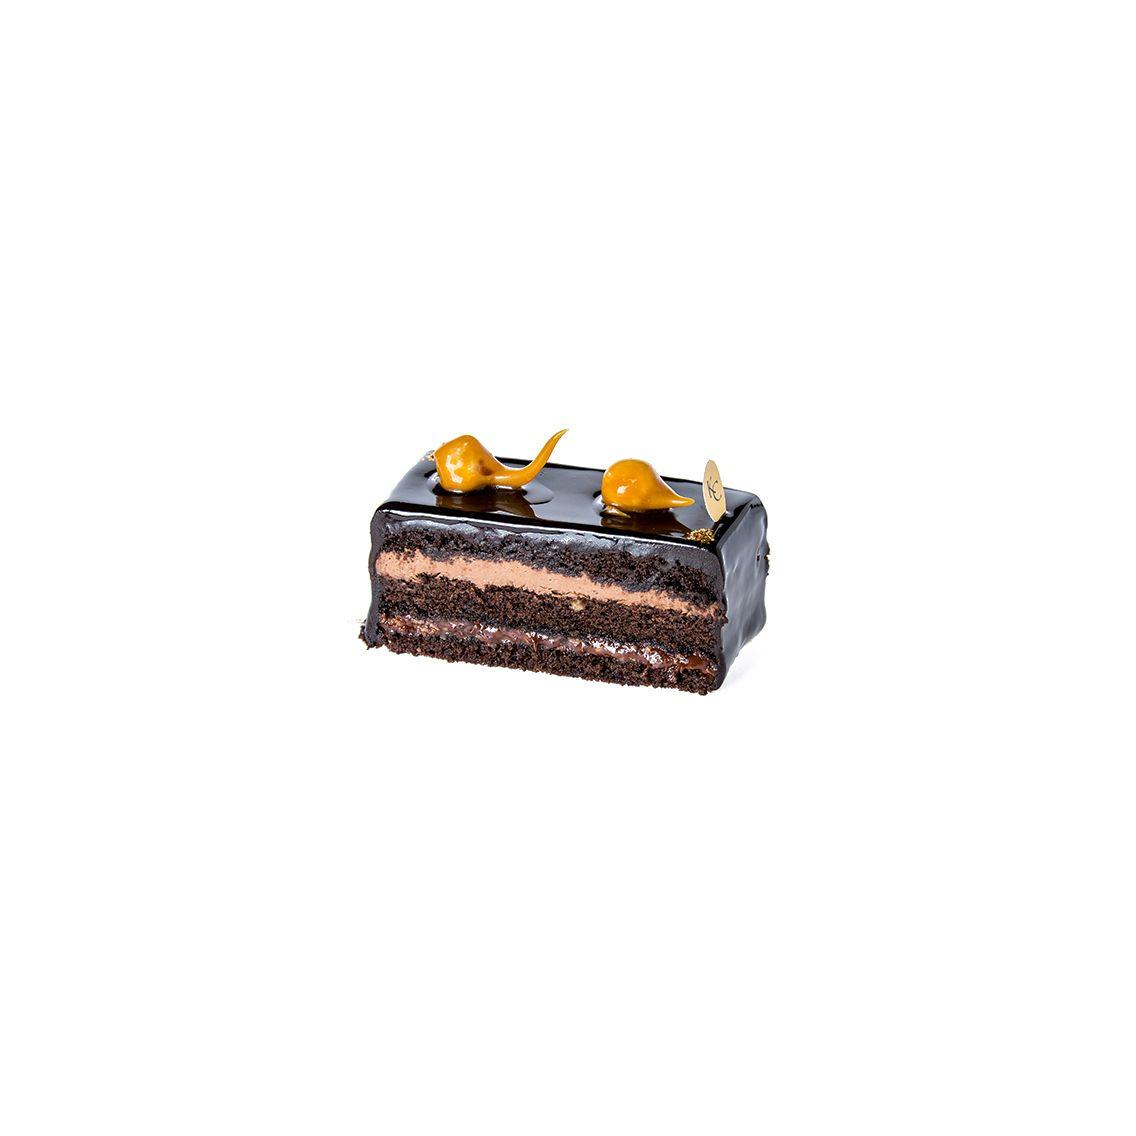 Kitchen Cuisine Default Category Chocolate Hazelnut delight Pastry